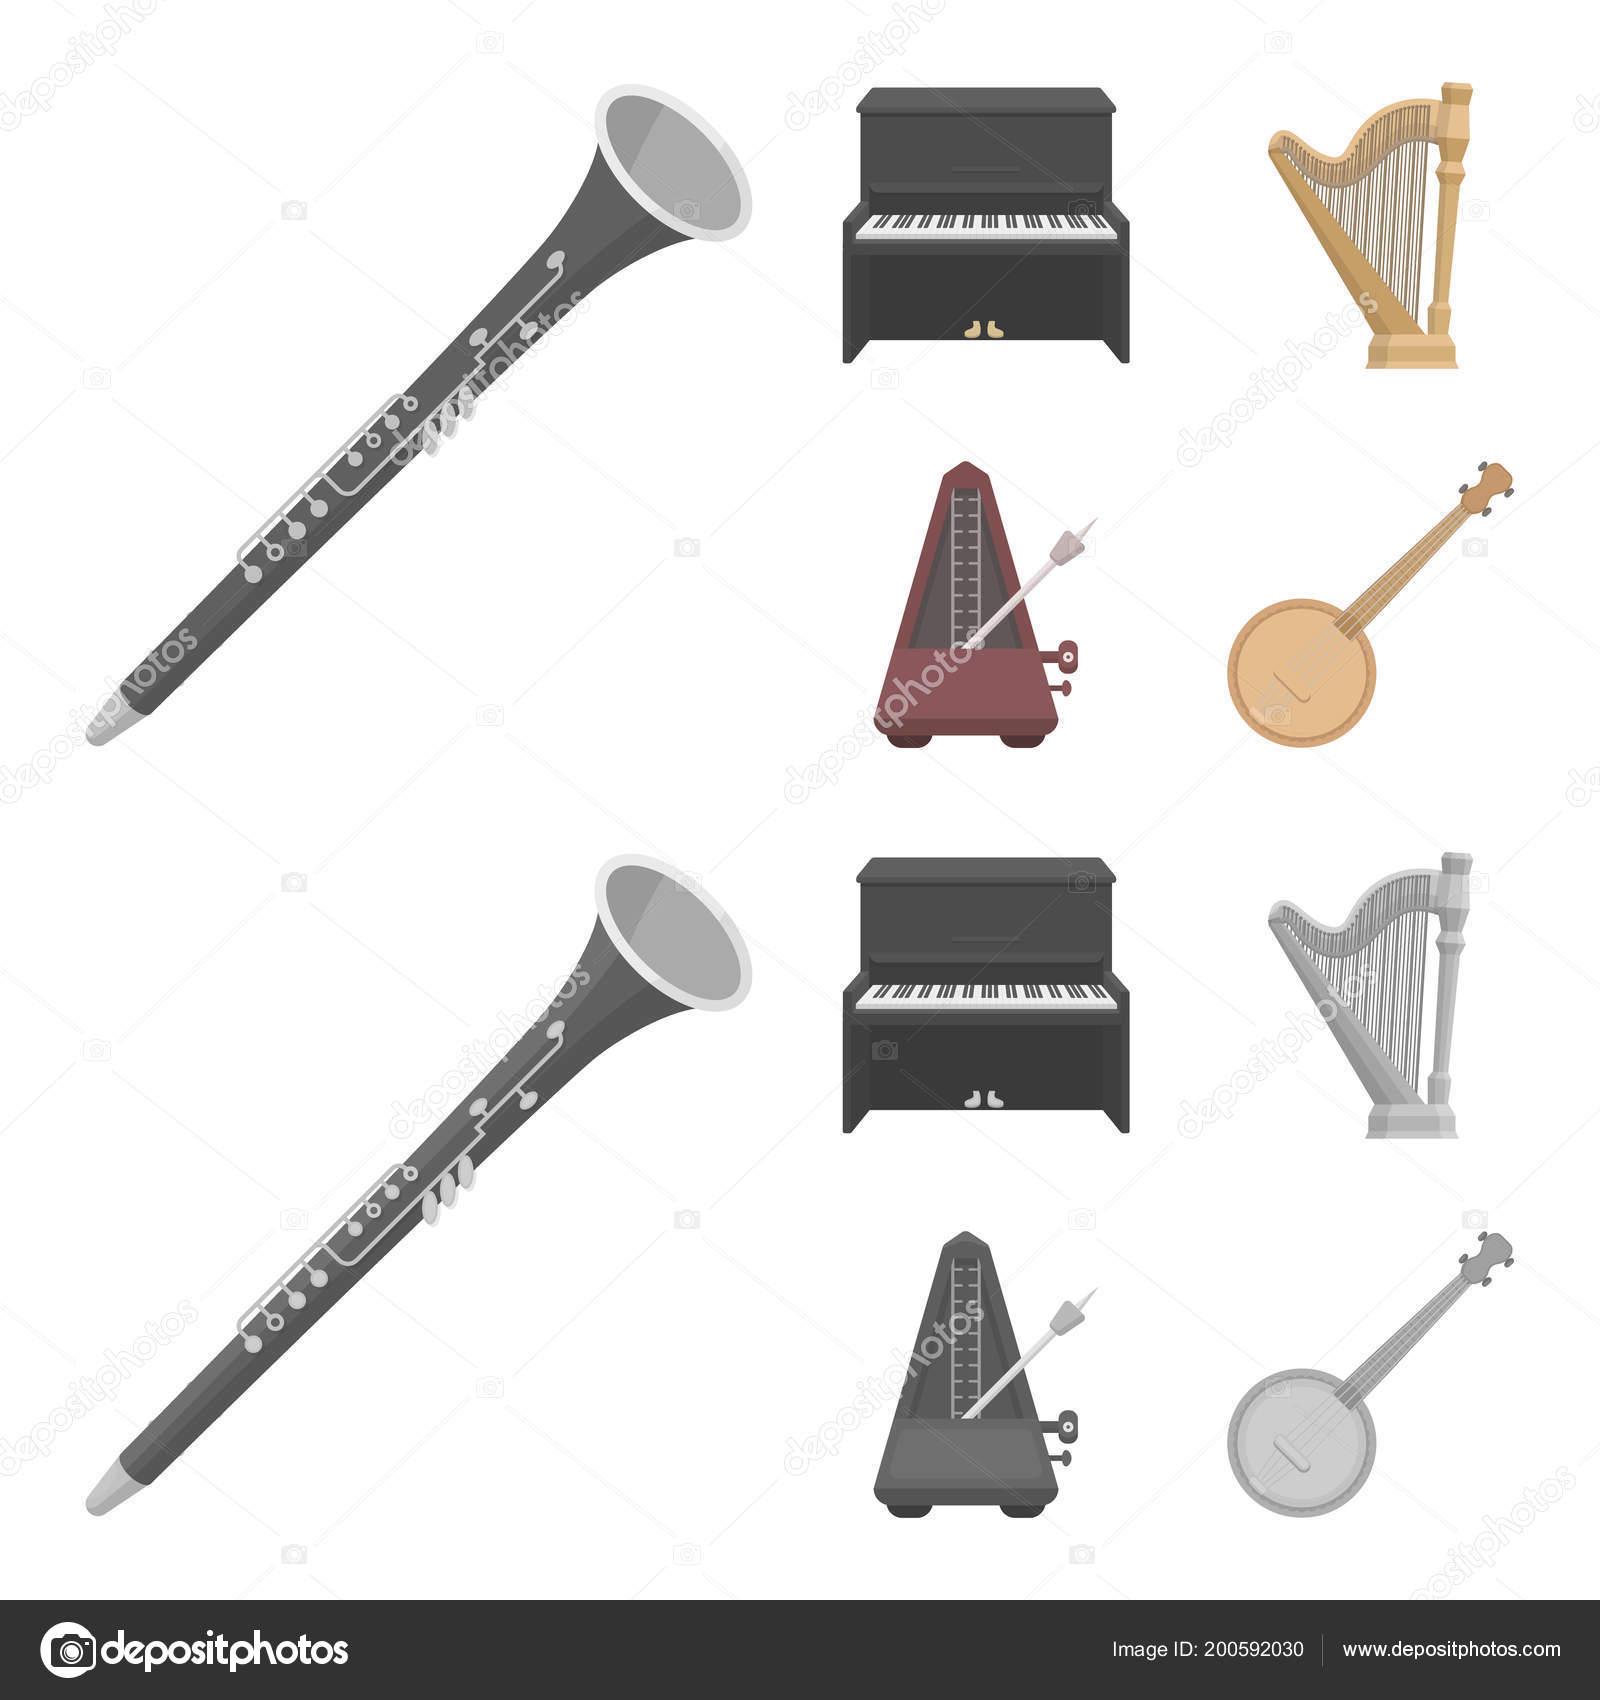 Banjo, piano, harp, metronome  Musical instruments set